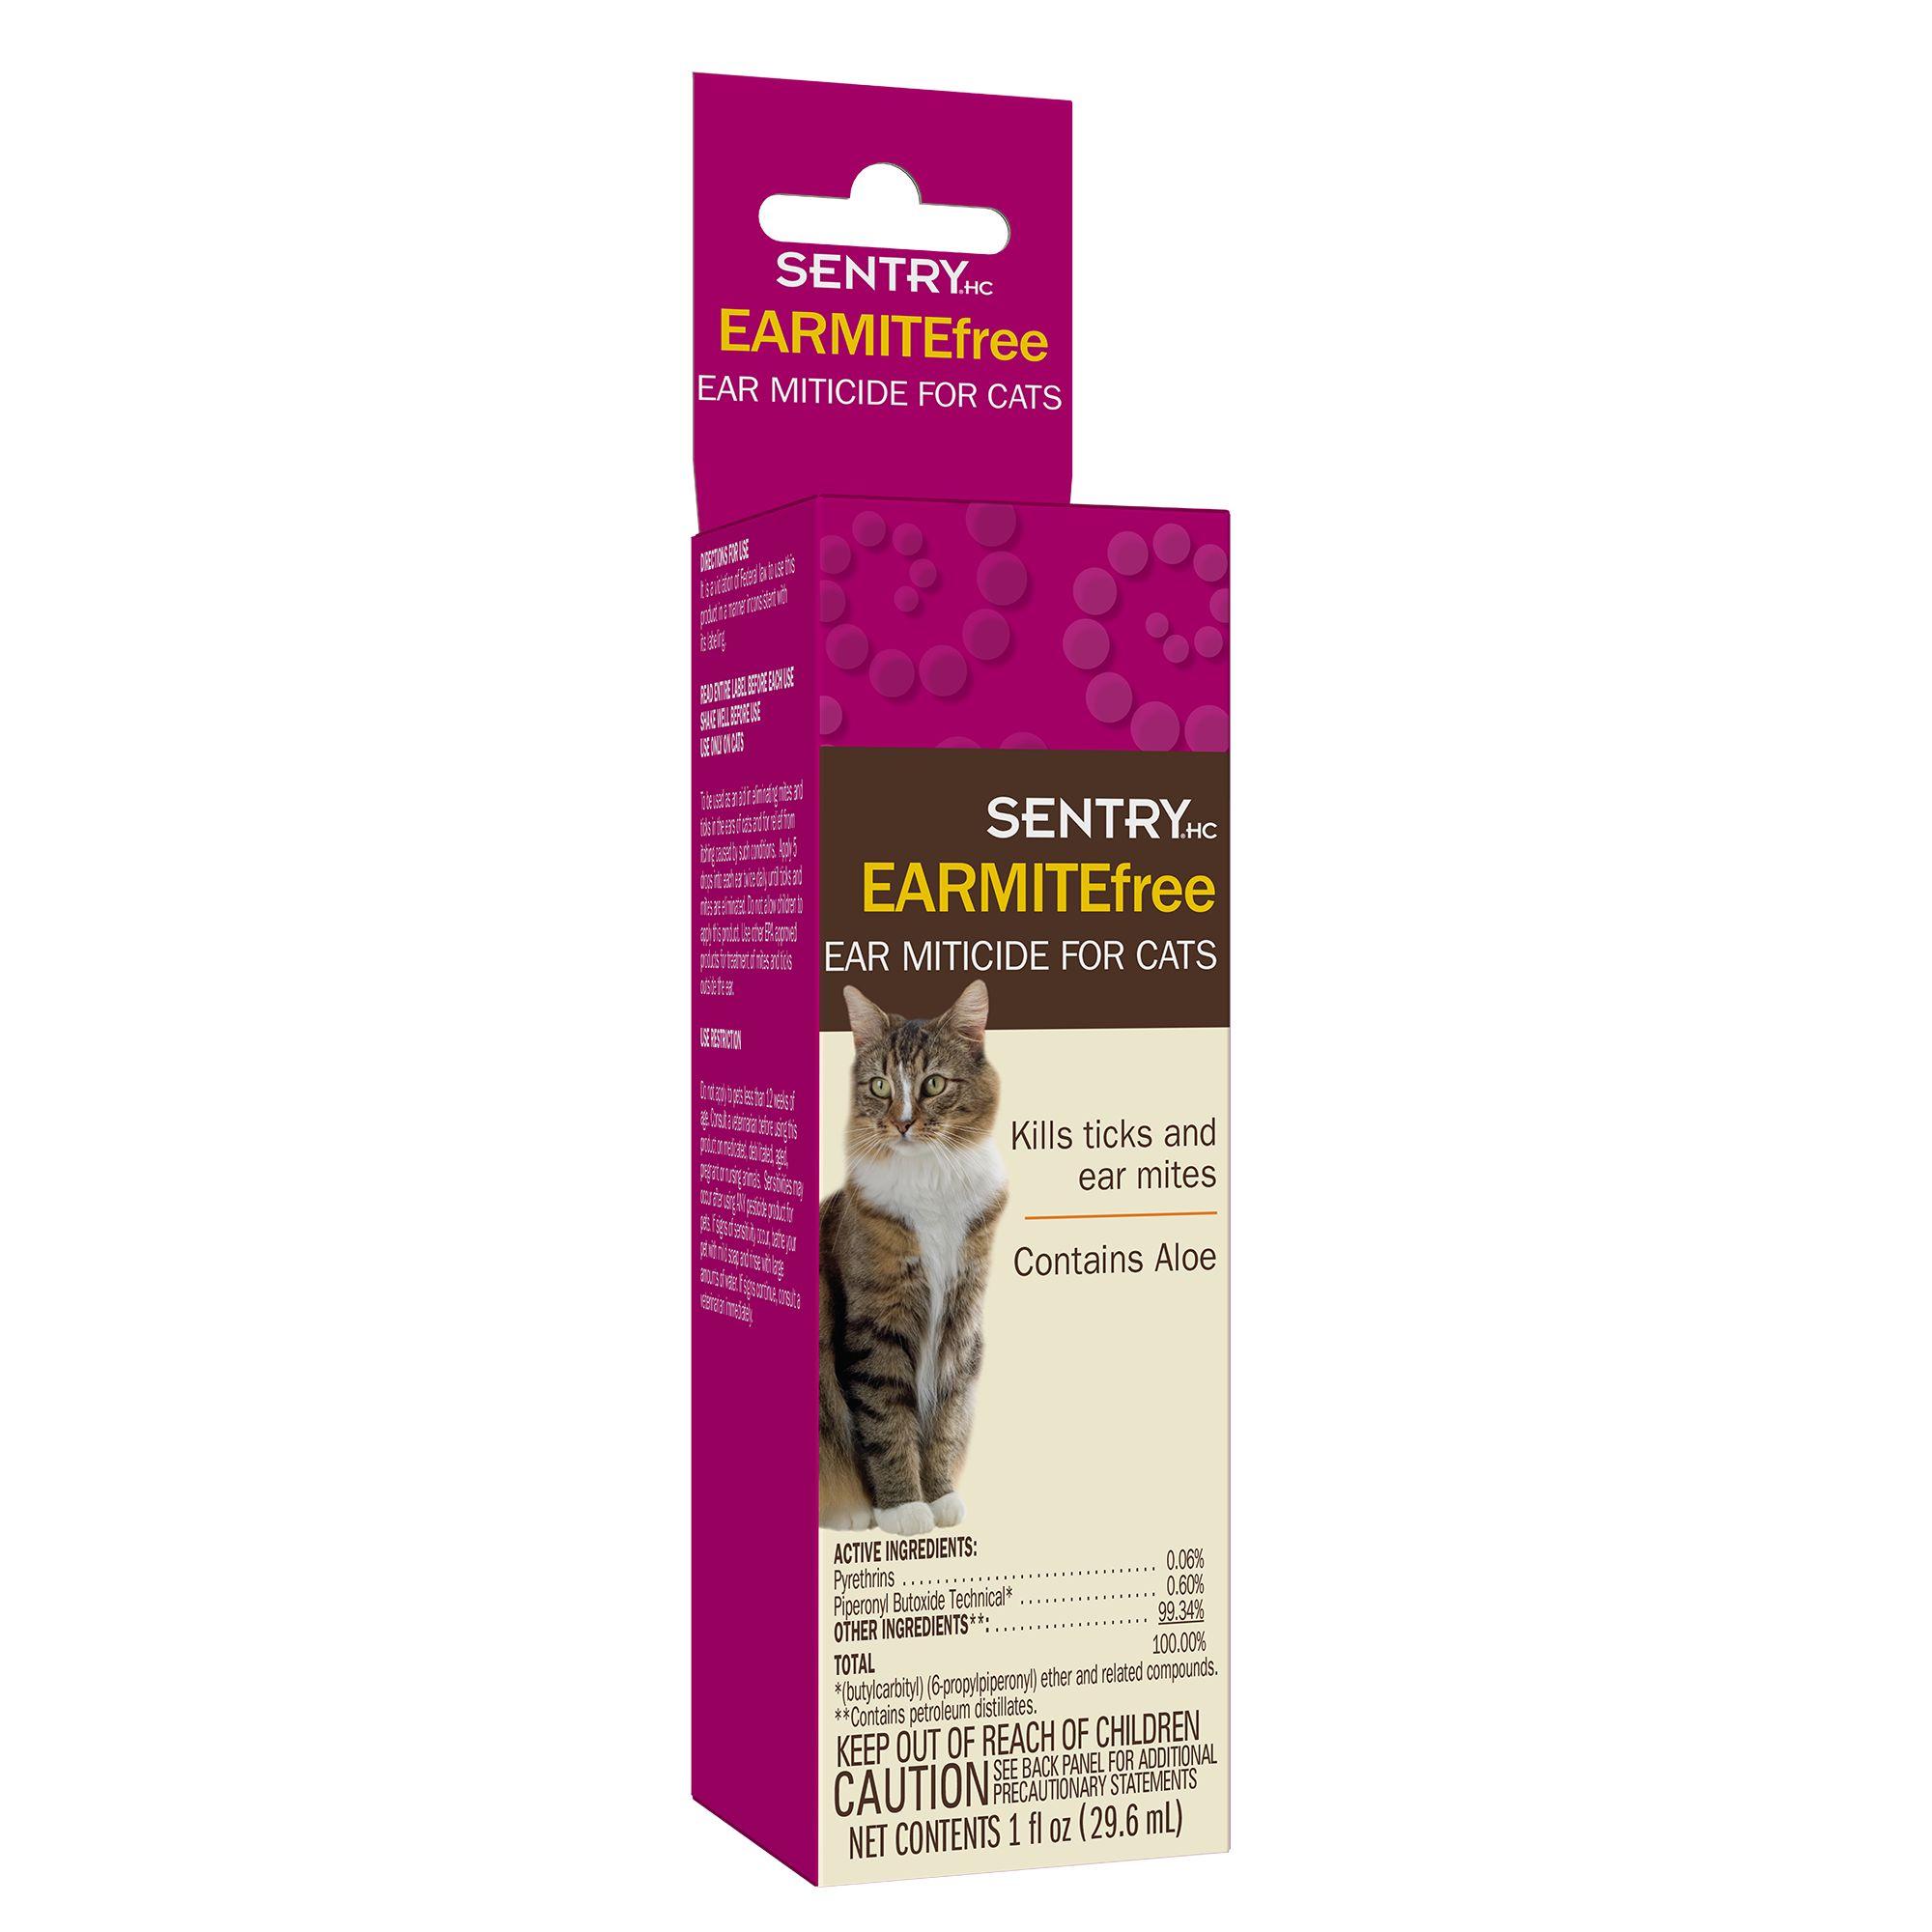 Sentryreg Earmitefree Cat Ear Miticide